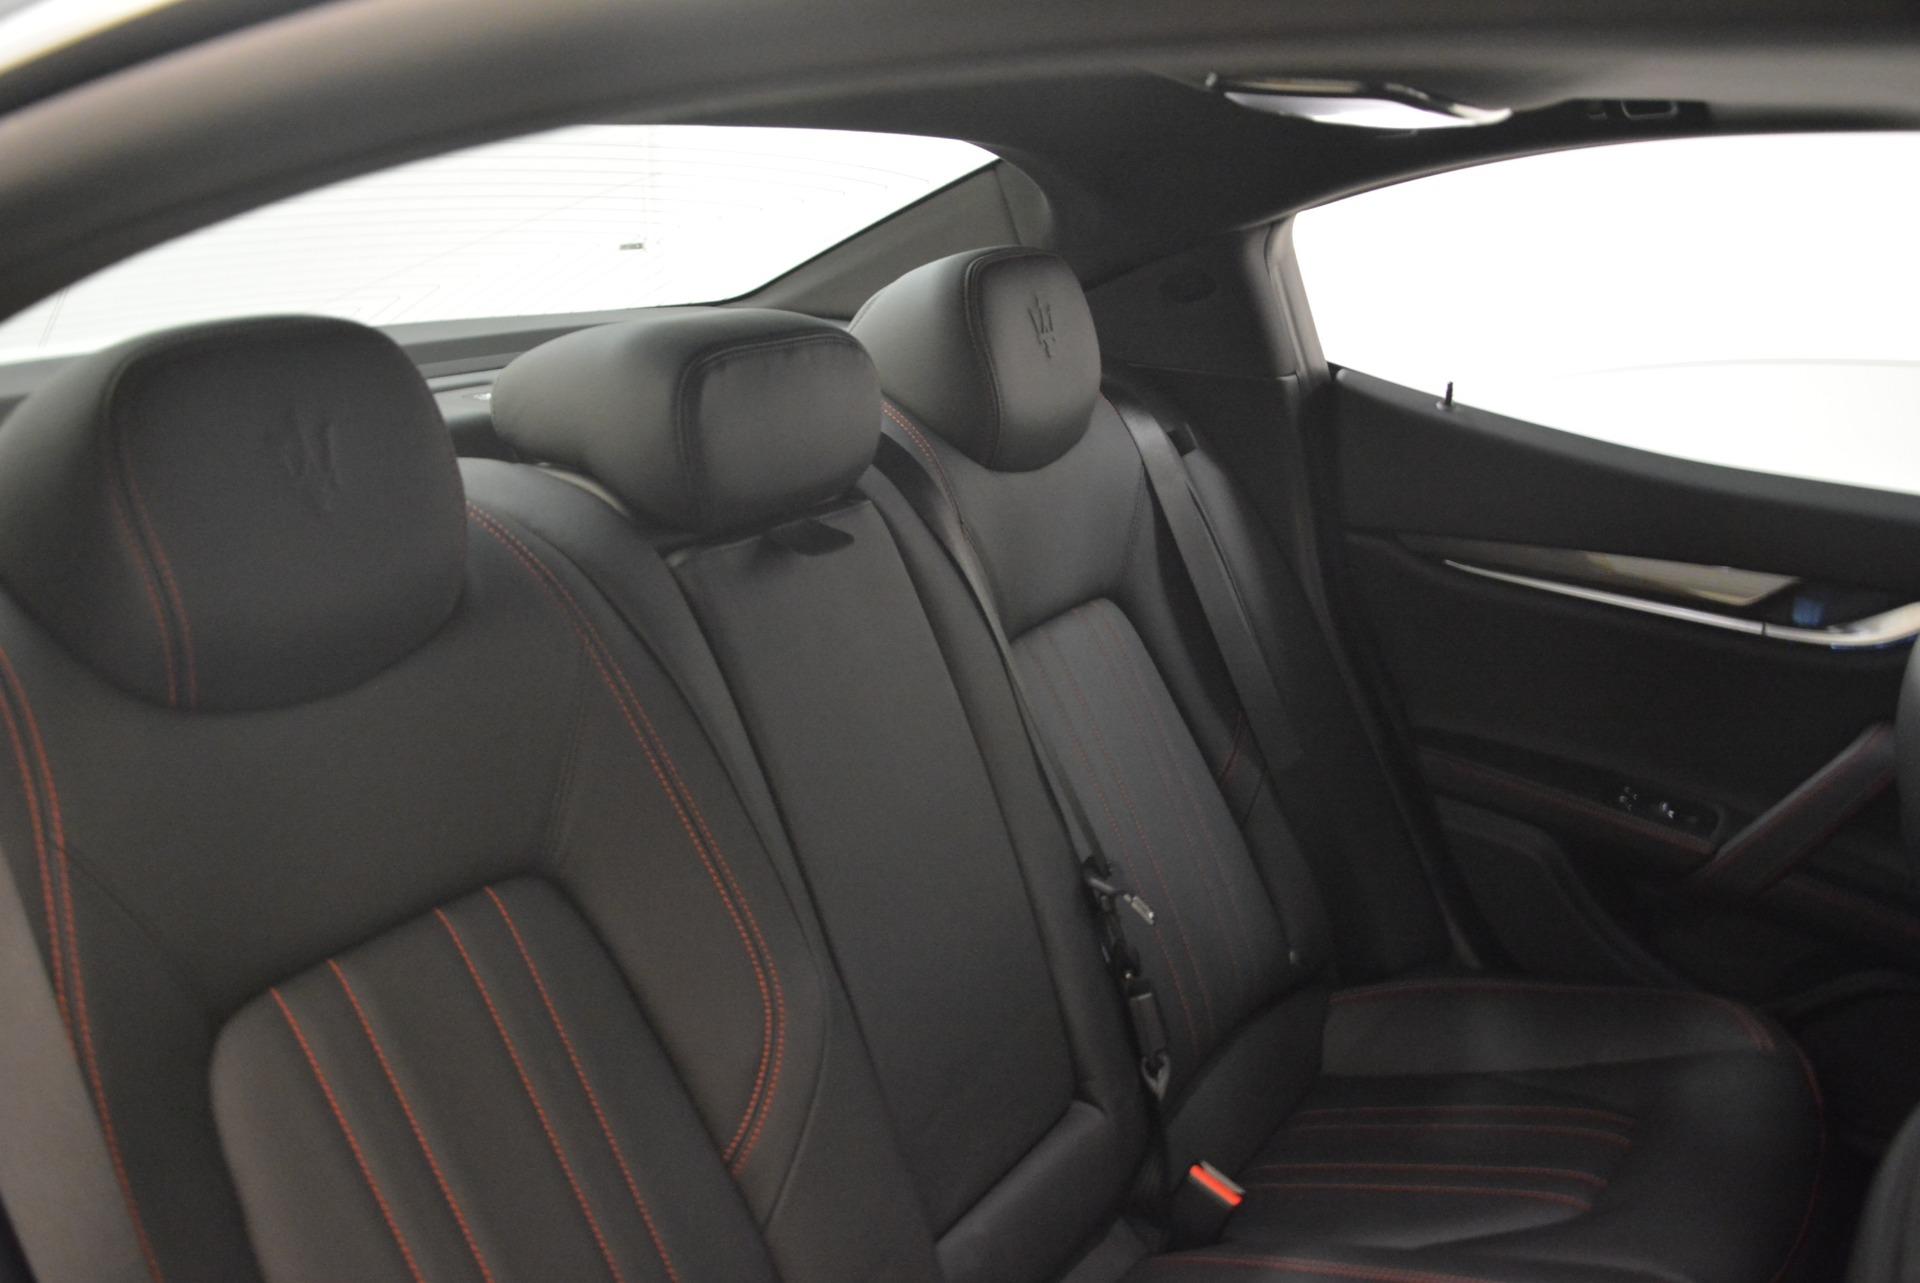 Used 2018 Maserati Ghibli S Q4 For Sale In Greenwich, CT 2271_p28